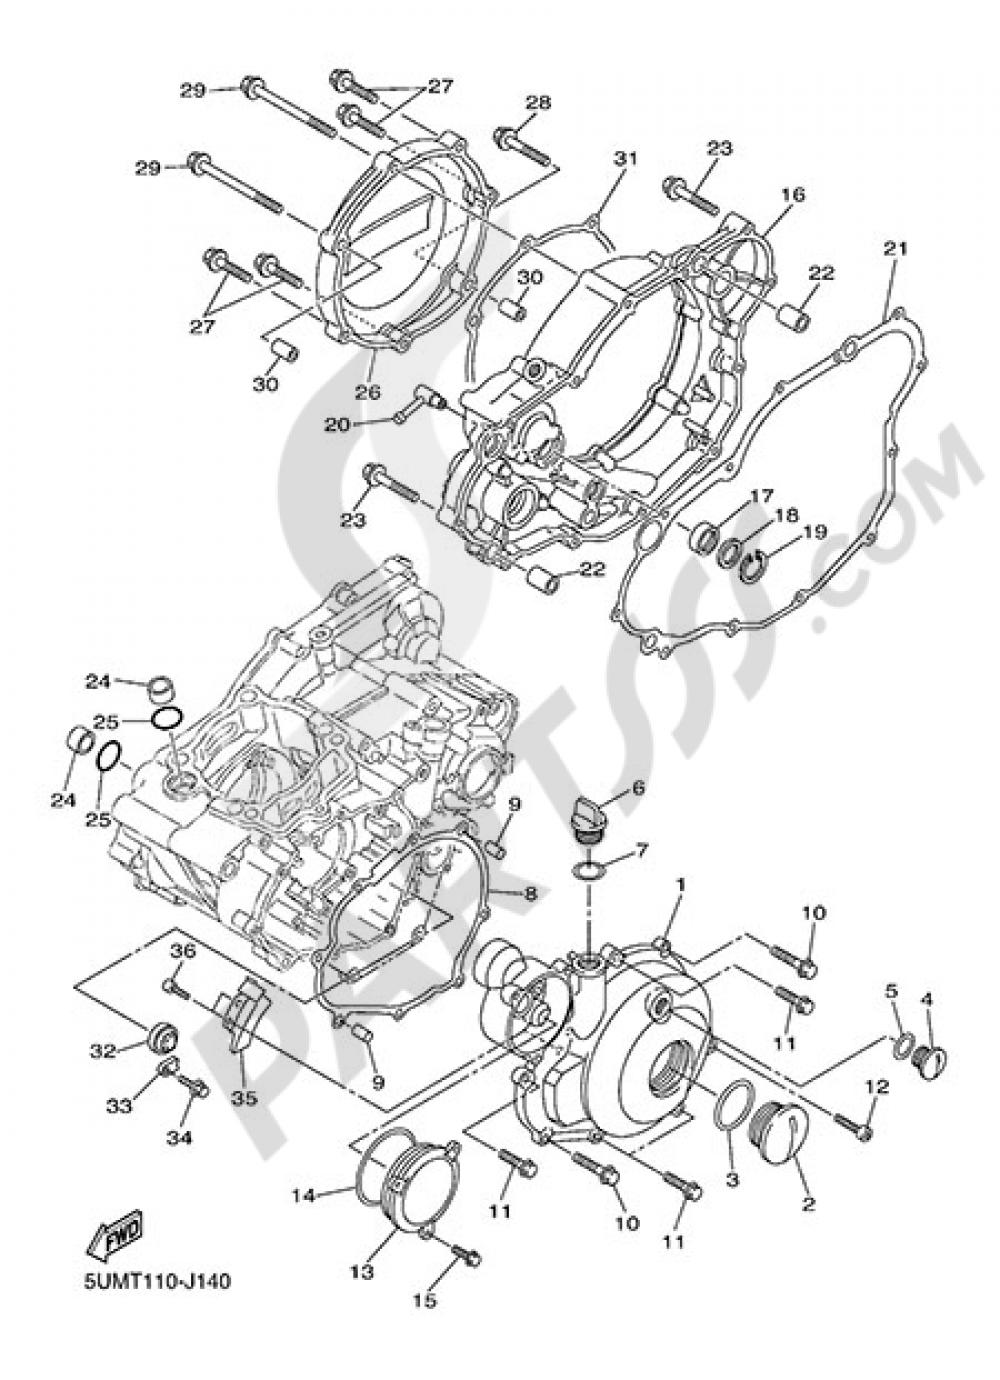 CRANKCASE COVER 1 Yamaha WR250F 2014